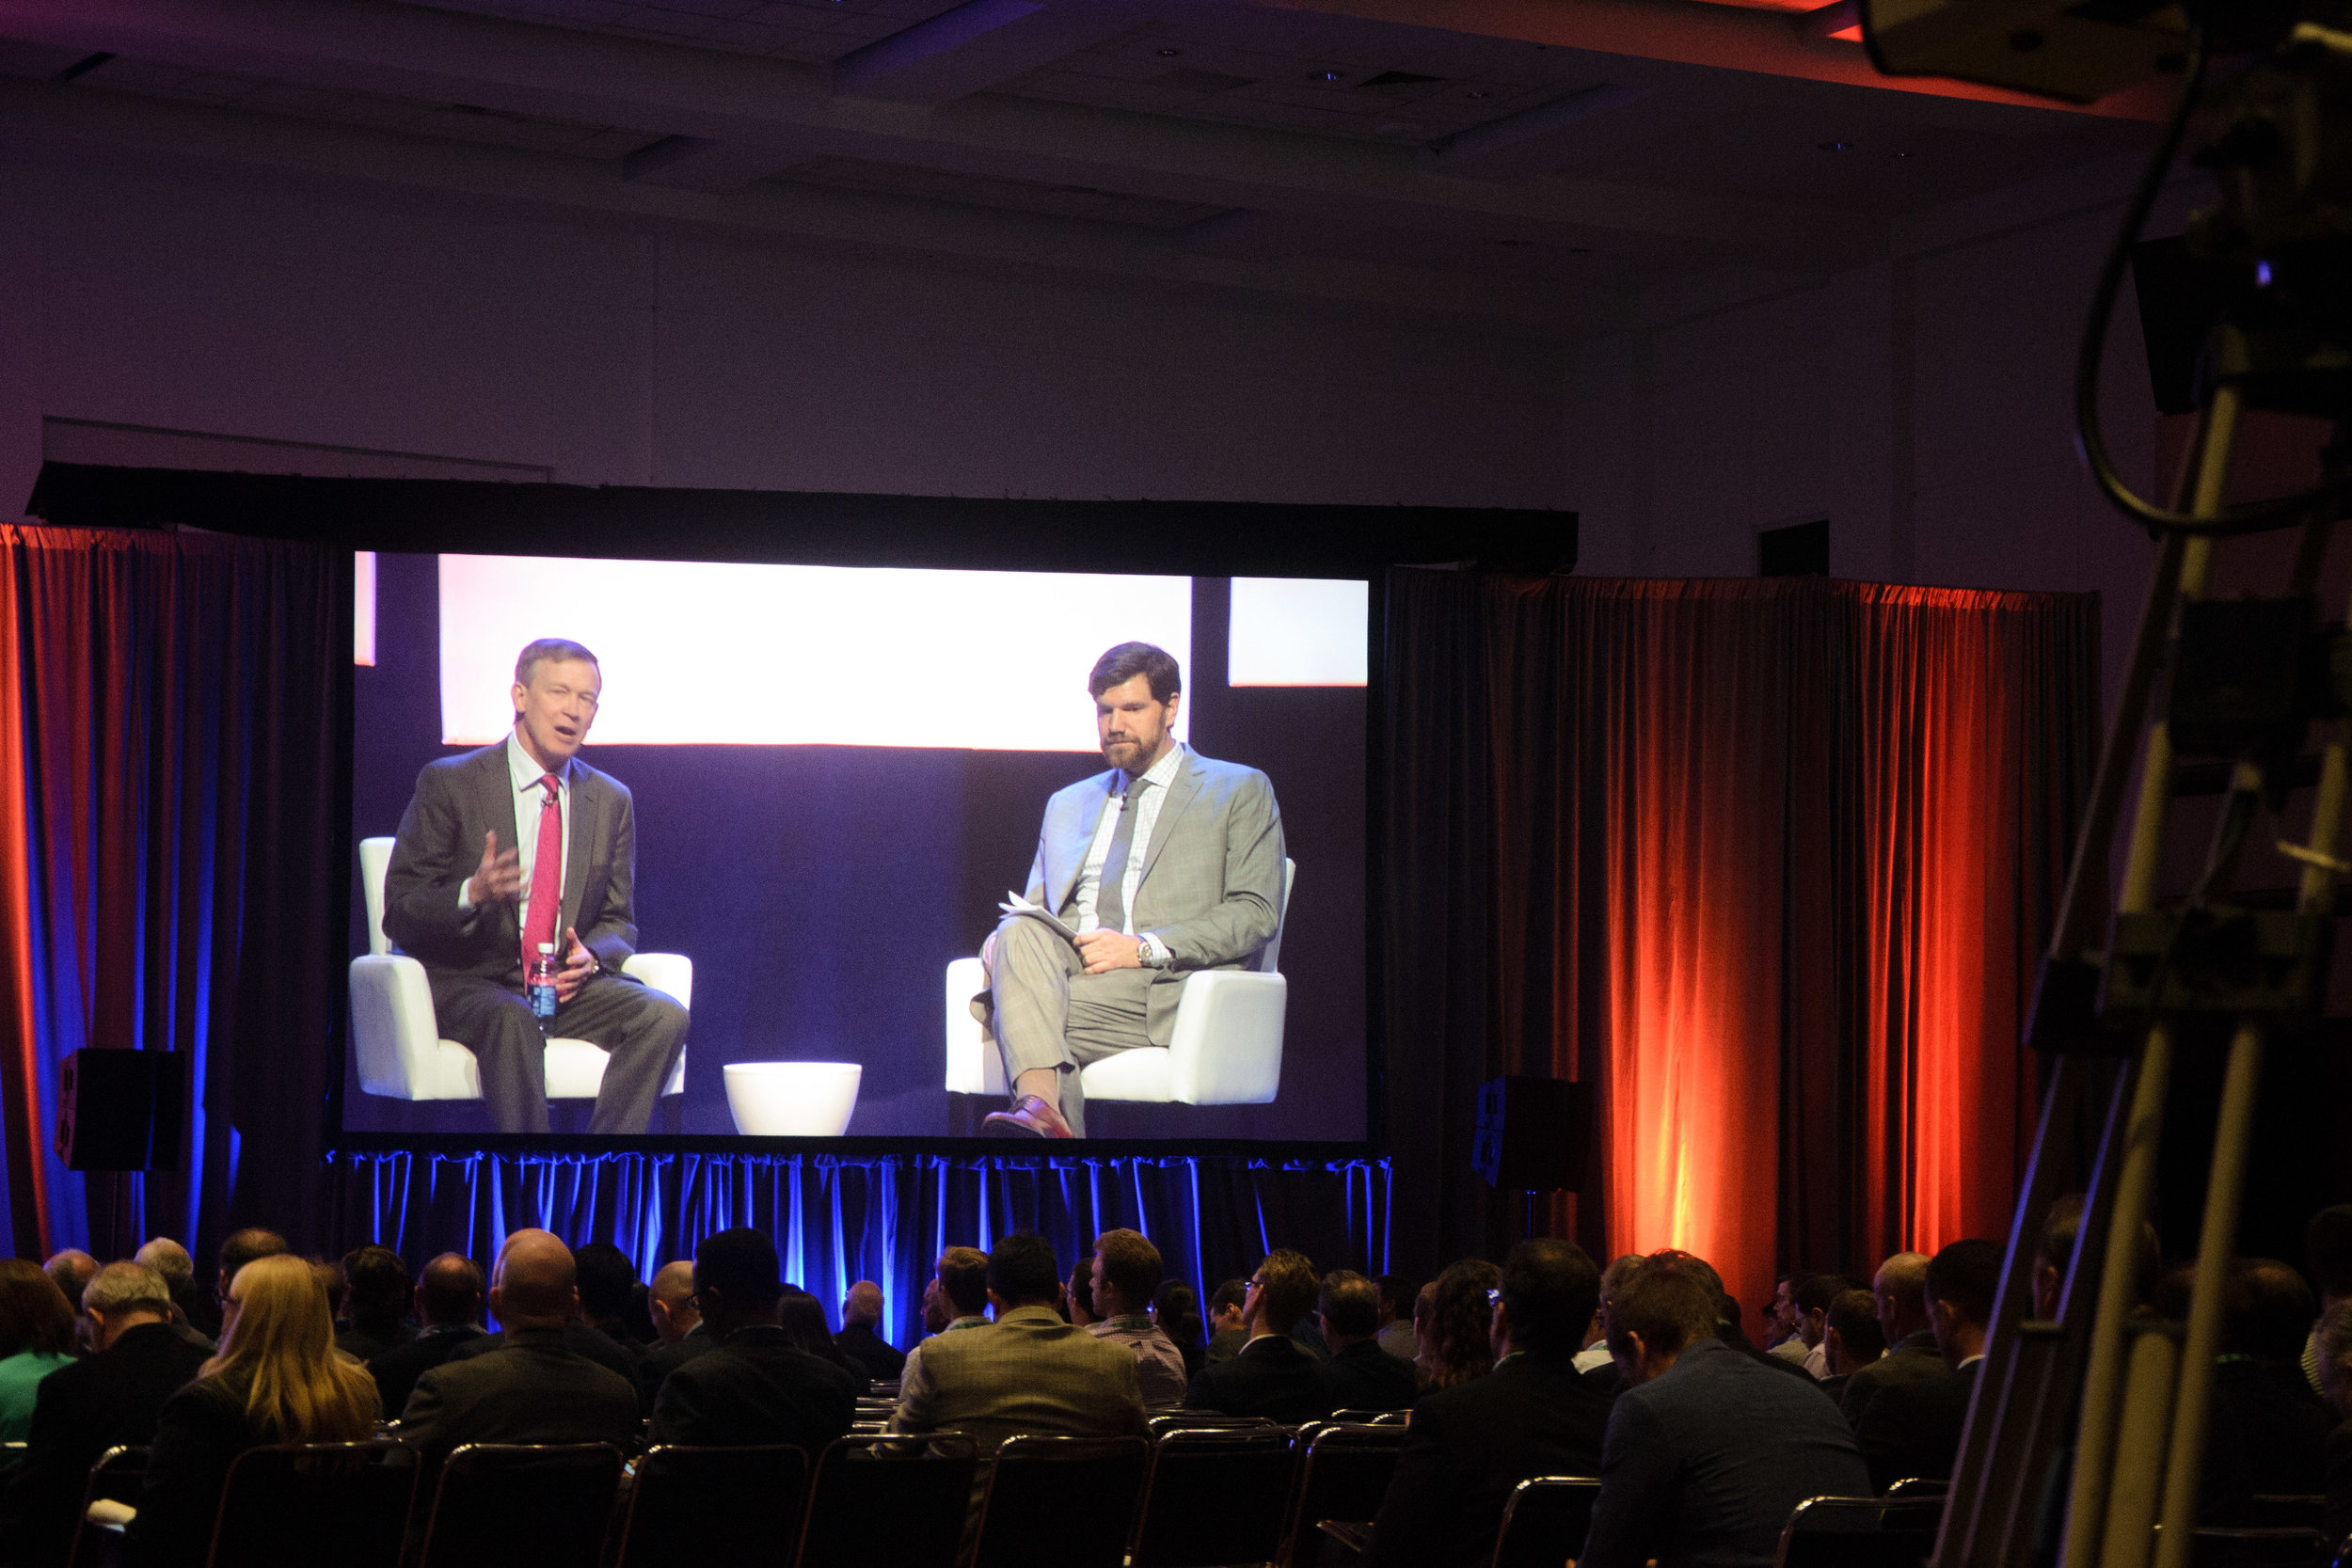 Colorado Governor Mark Hickenlooper (left) discusses Colorado's energy future with ESA Director Matt Roberts.